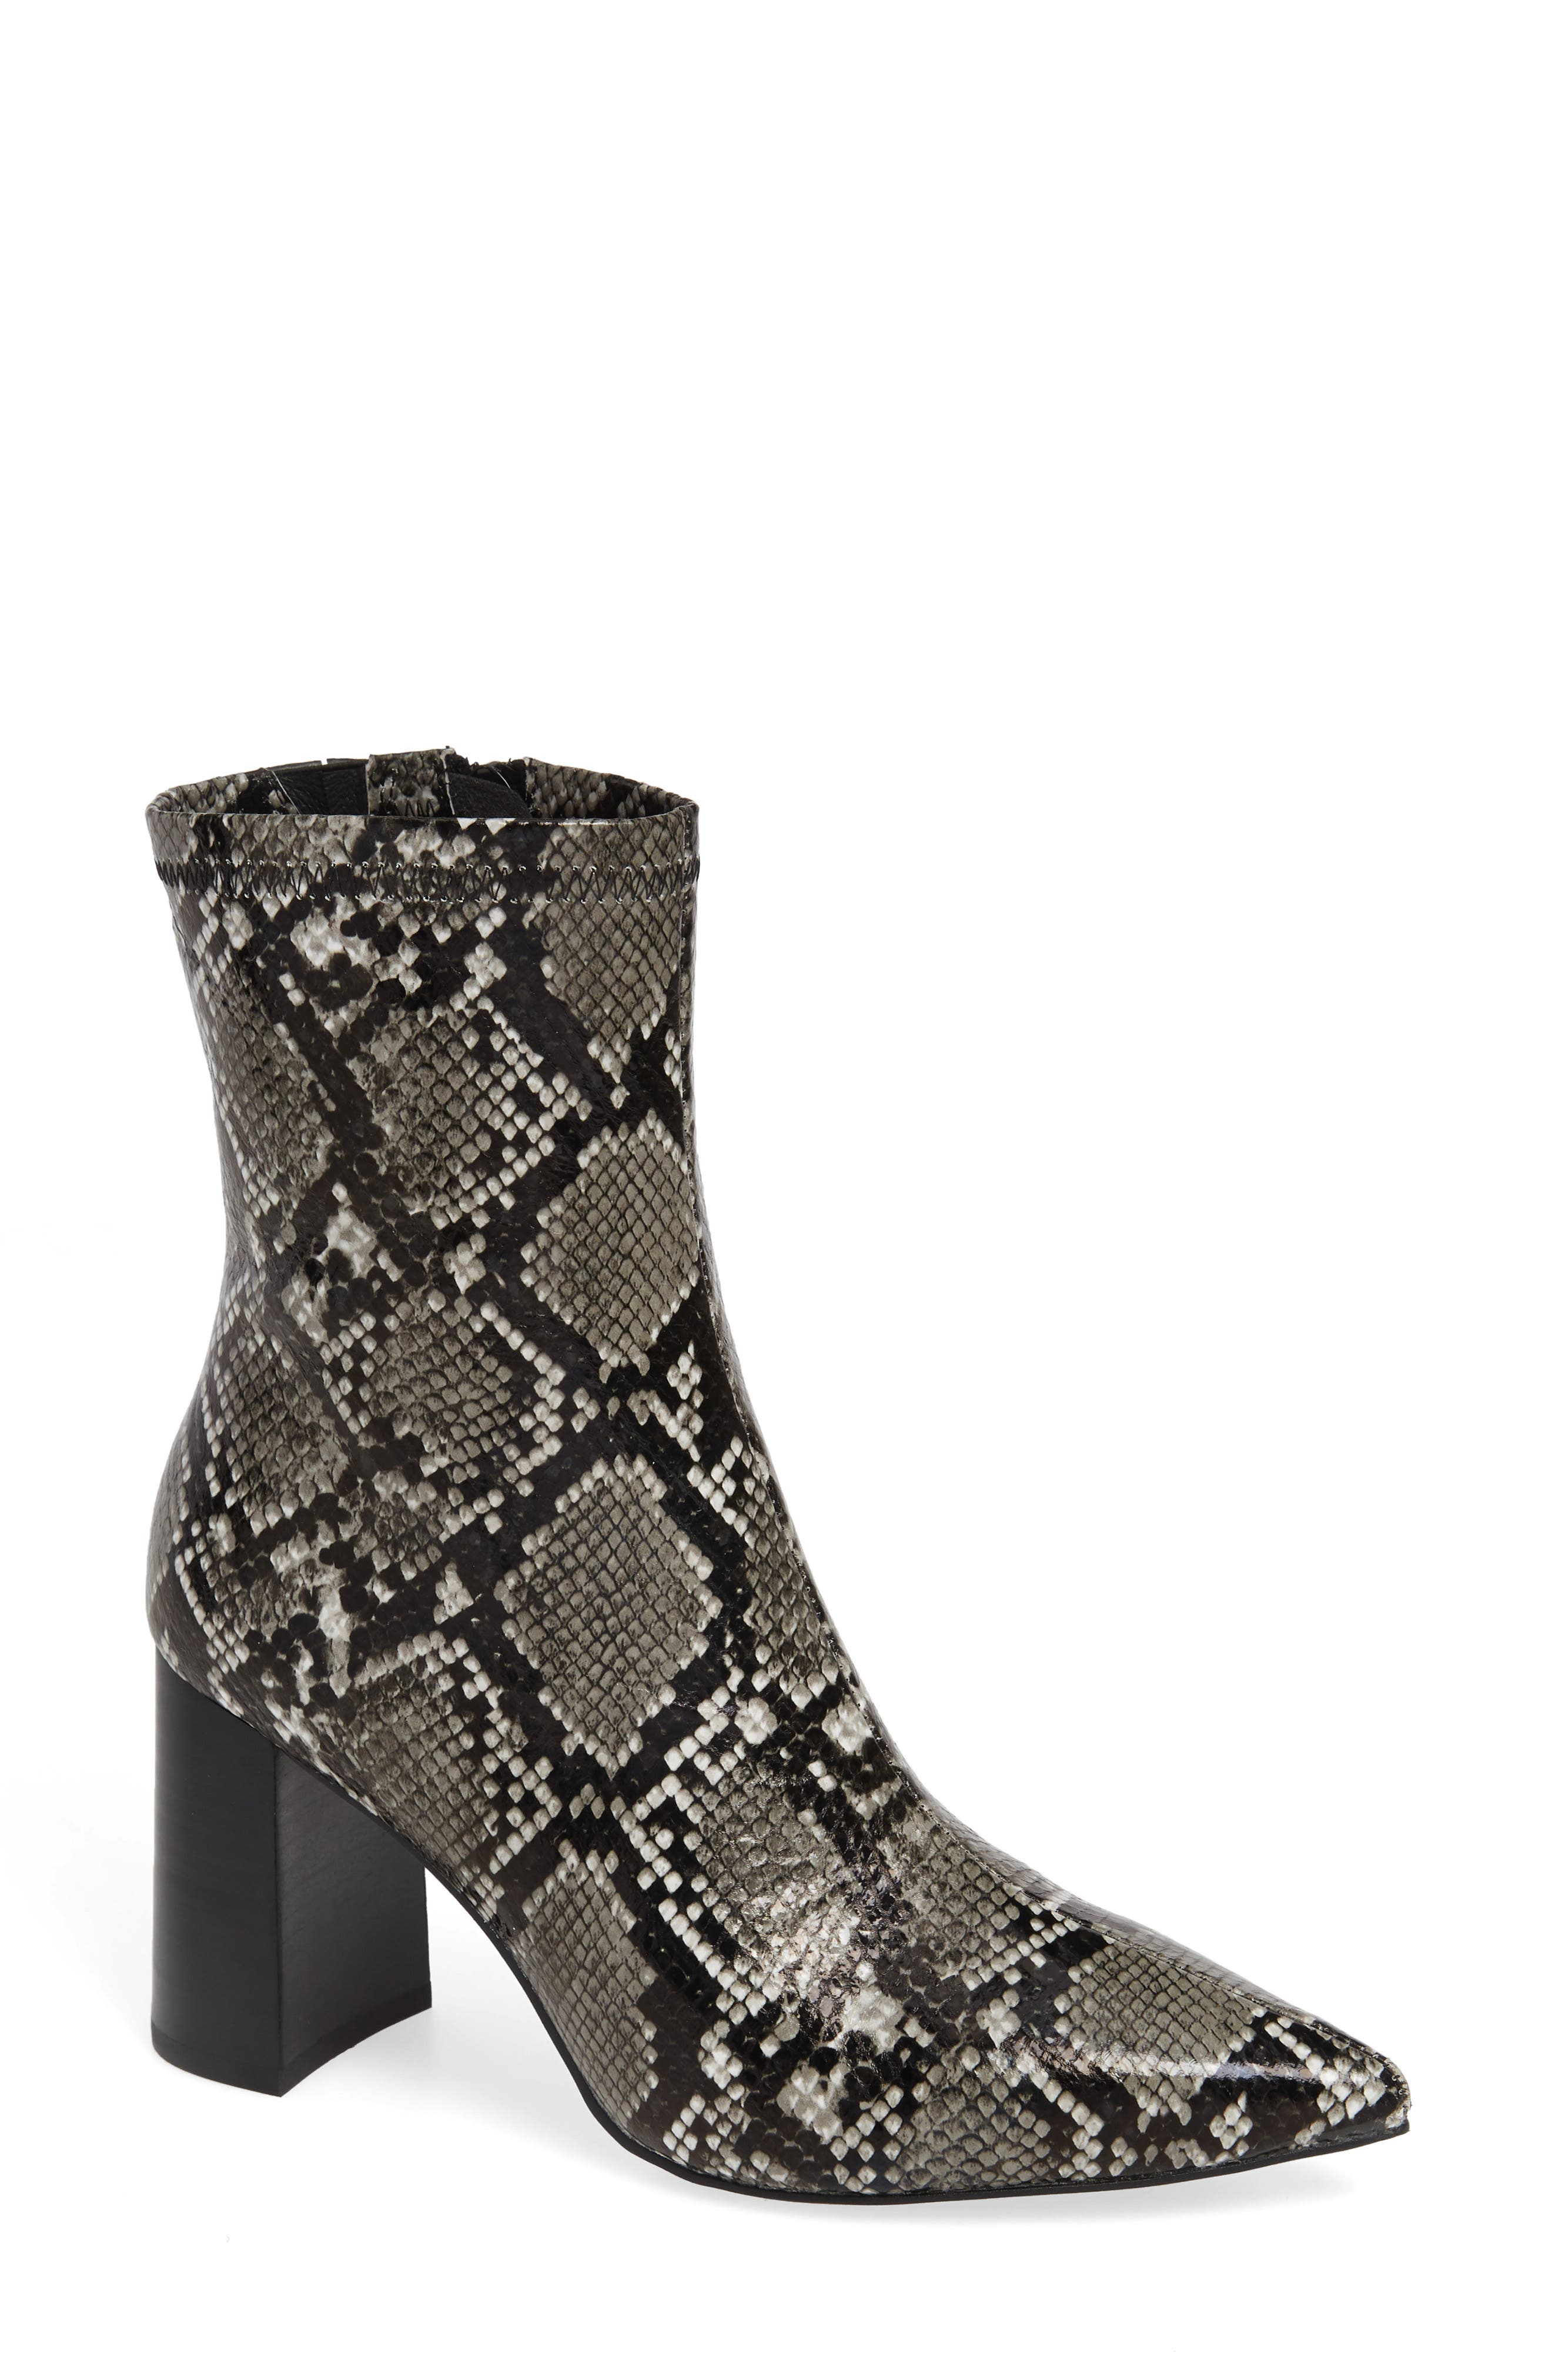 Coma 3 Block Heel Bootie in Grey/ Black Snake Print